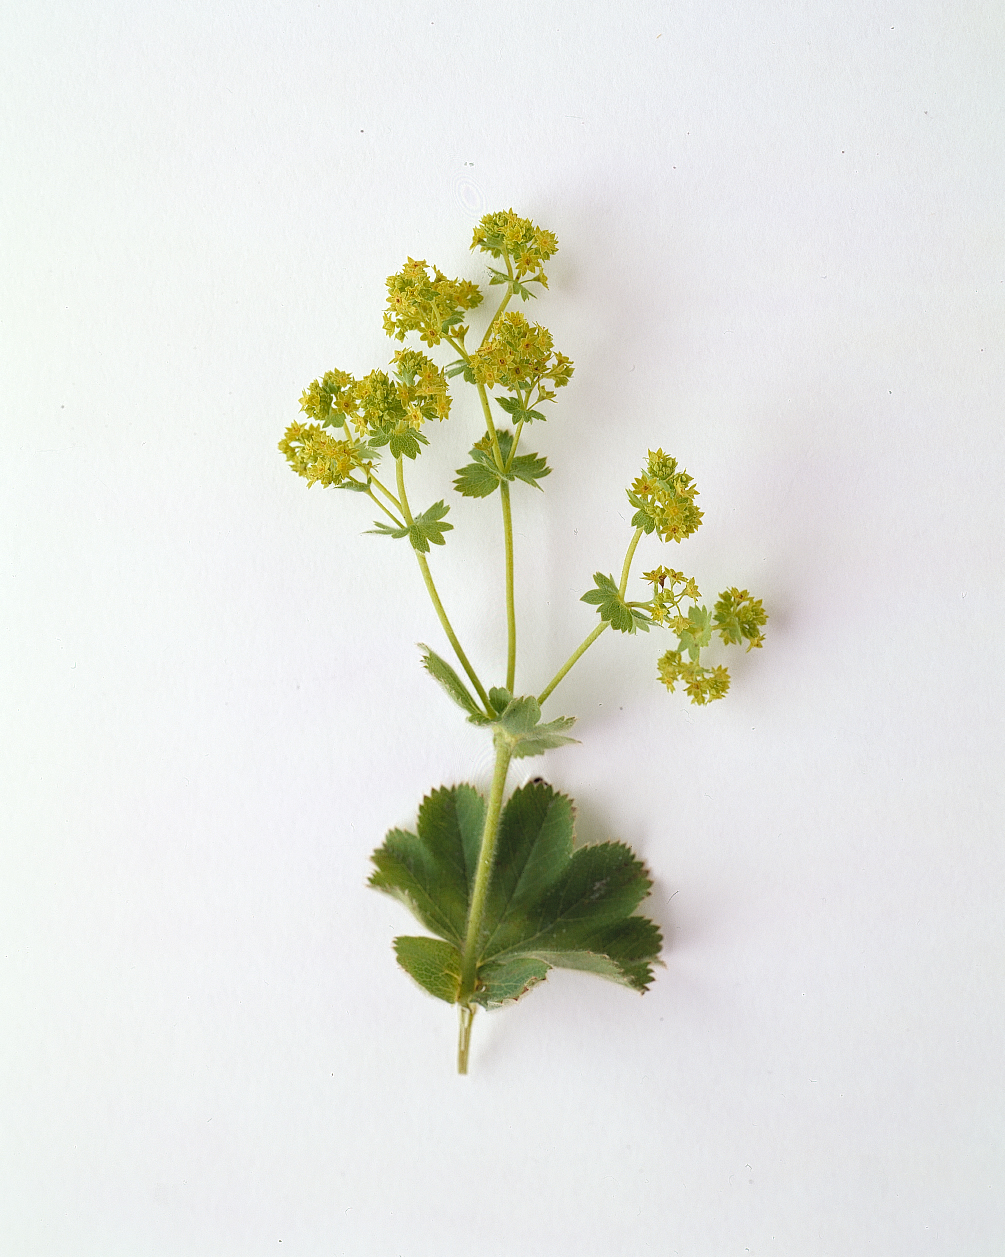 flower-glossary-ladysmantle-a98432-0415.jpg